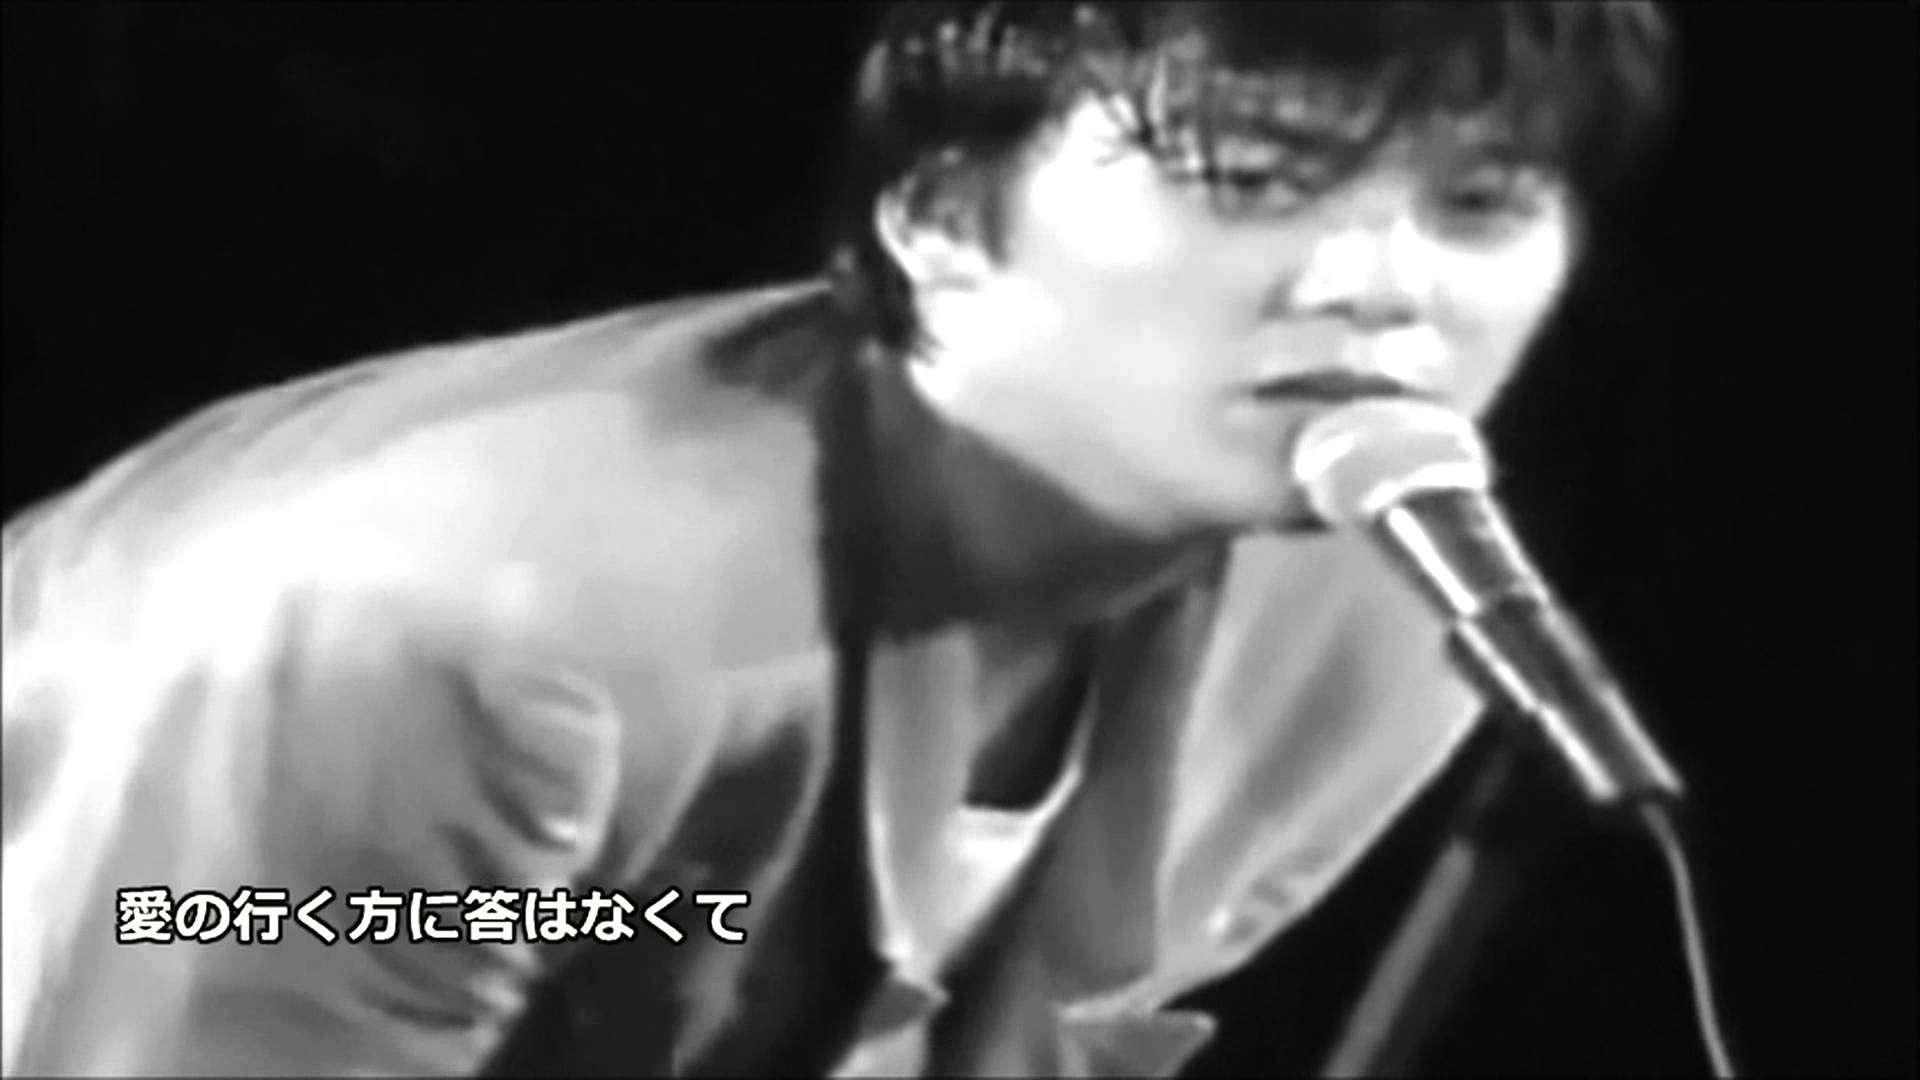 尾崎豊 Forget me not  【PV風 歌詞付 高音質版】 - YouTube